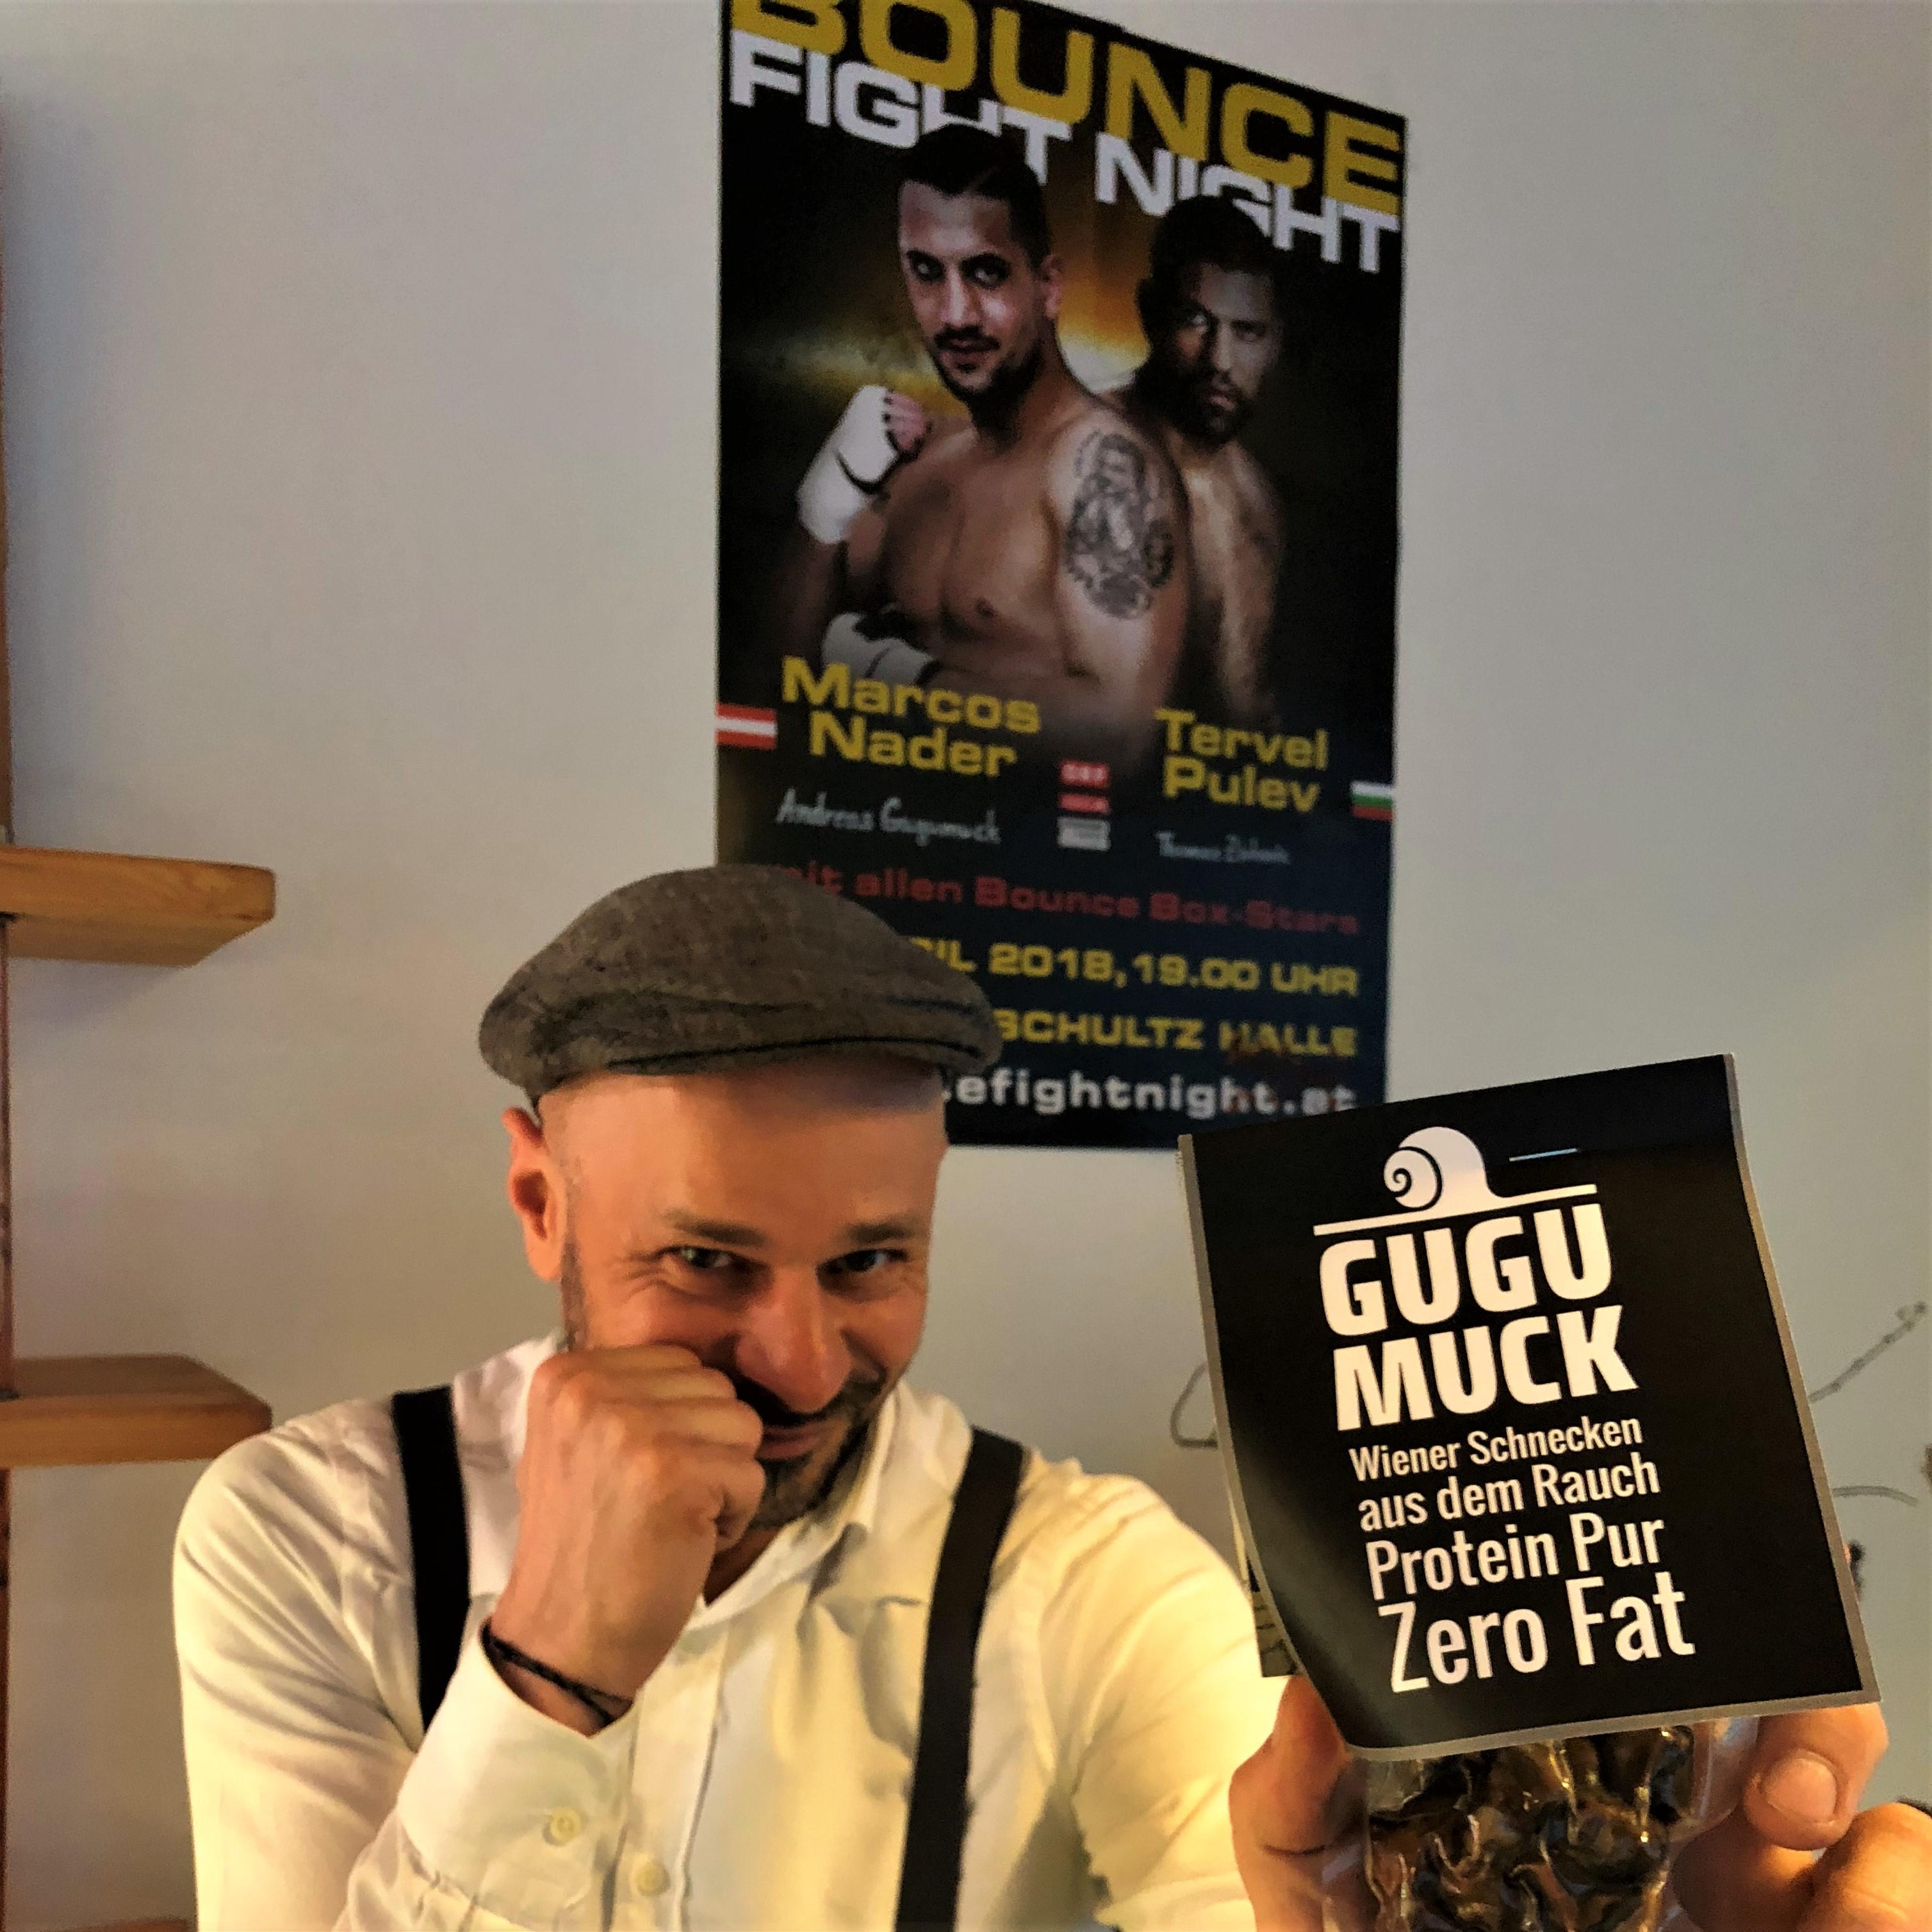 Bounce fight night 2018 mit Marcos Nader und Andreas Gugumuck